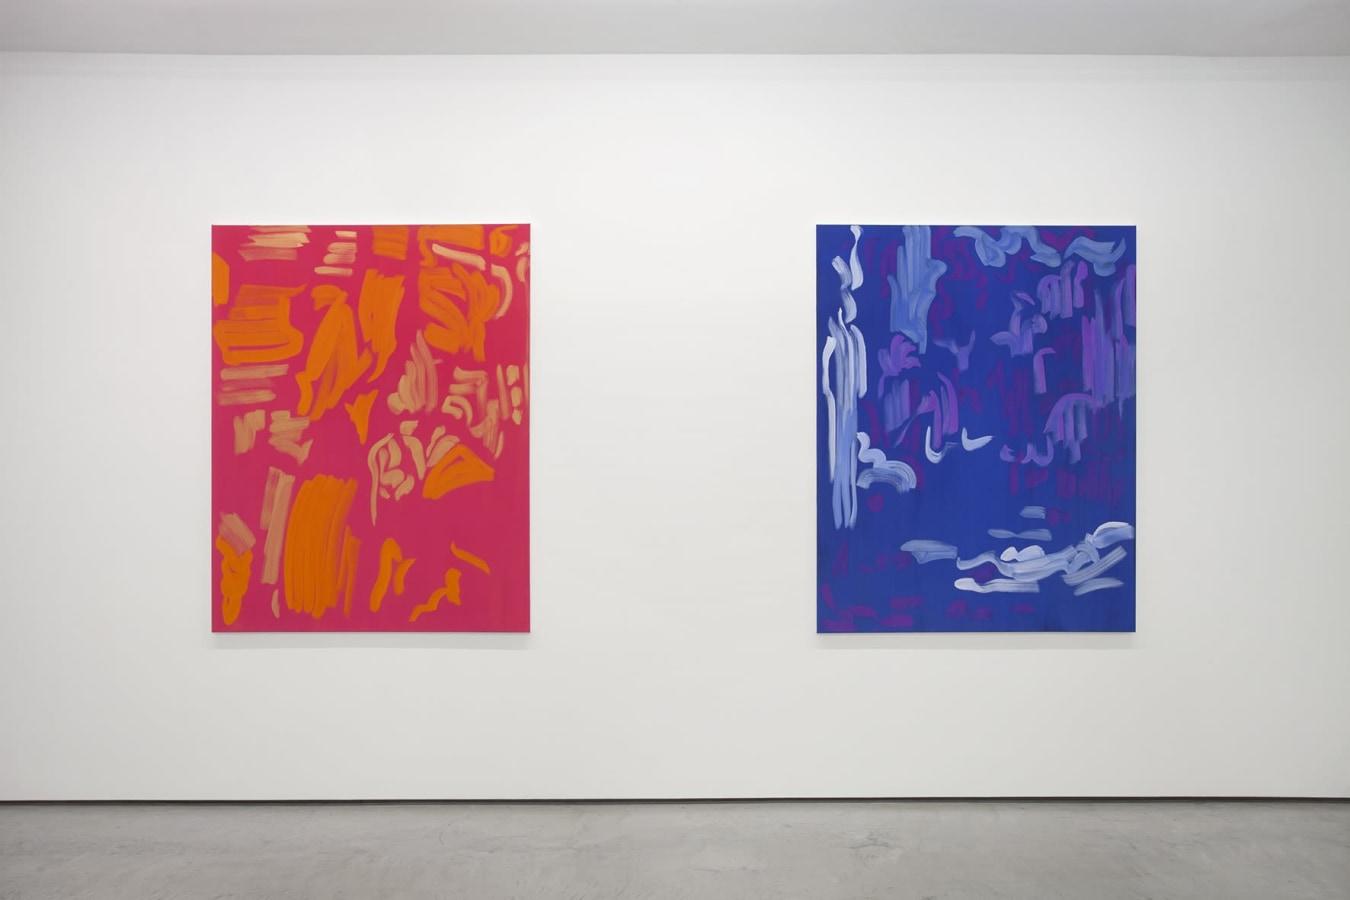 Self - Contemporary, Evi Vingerling,